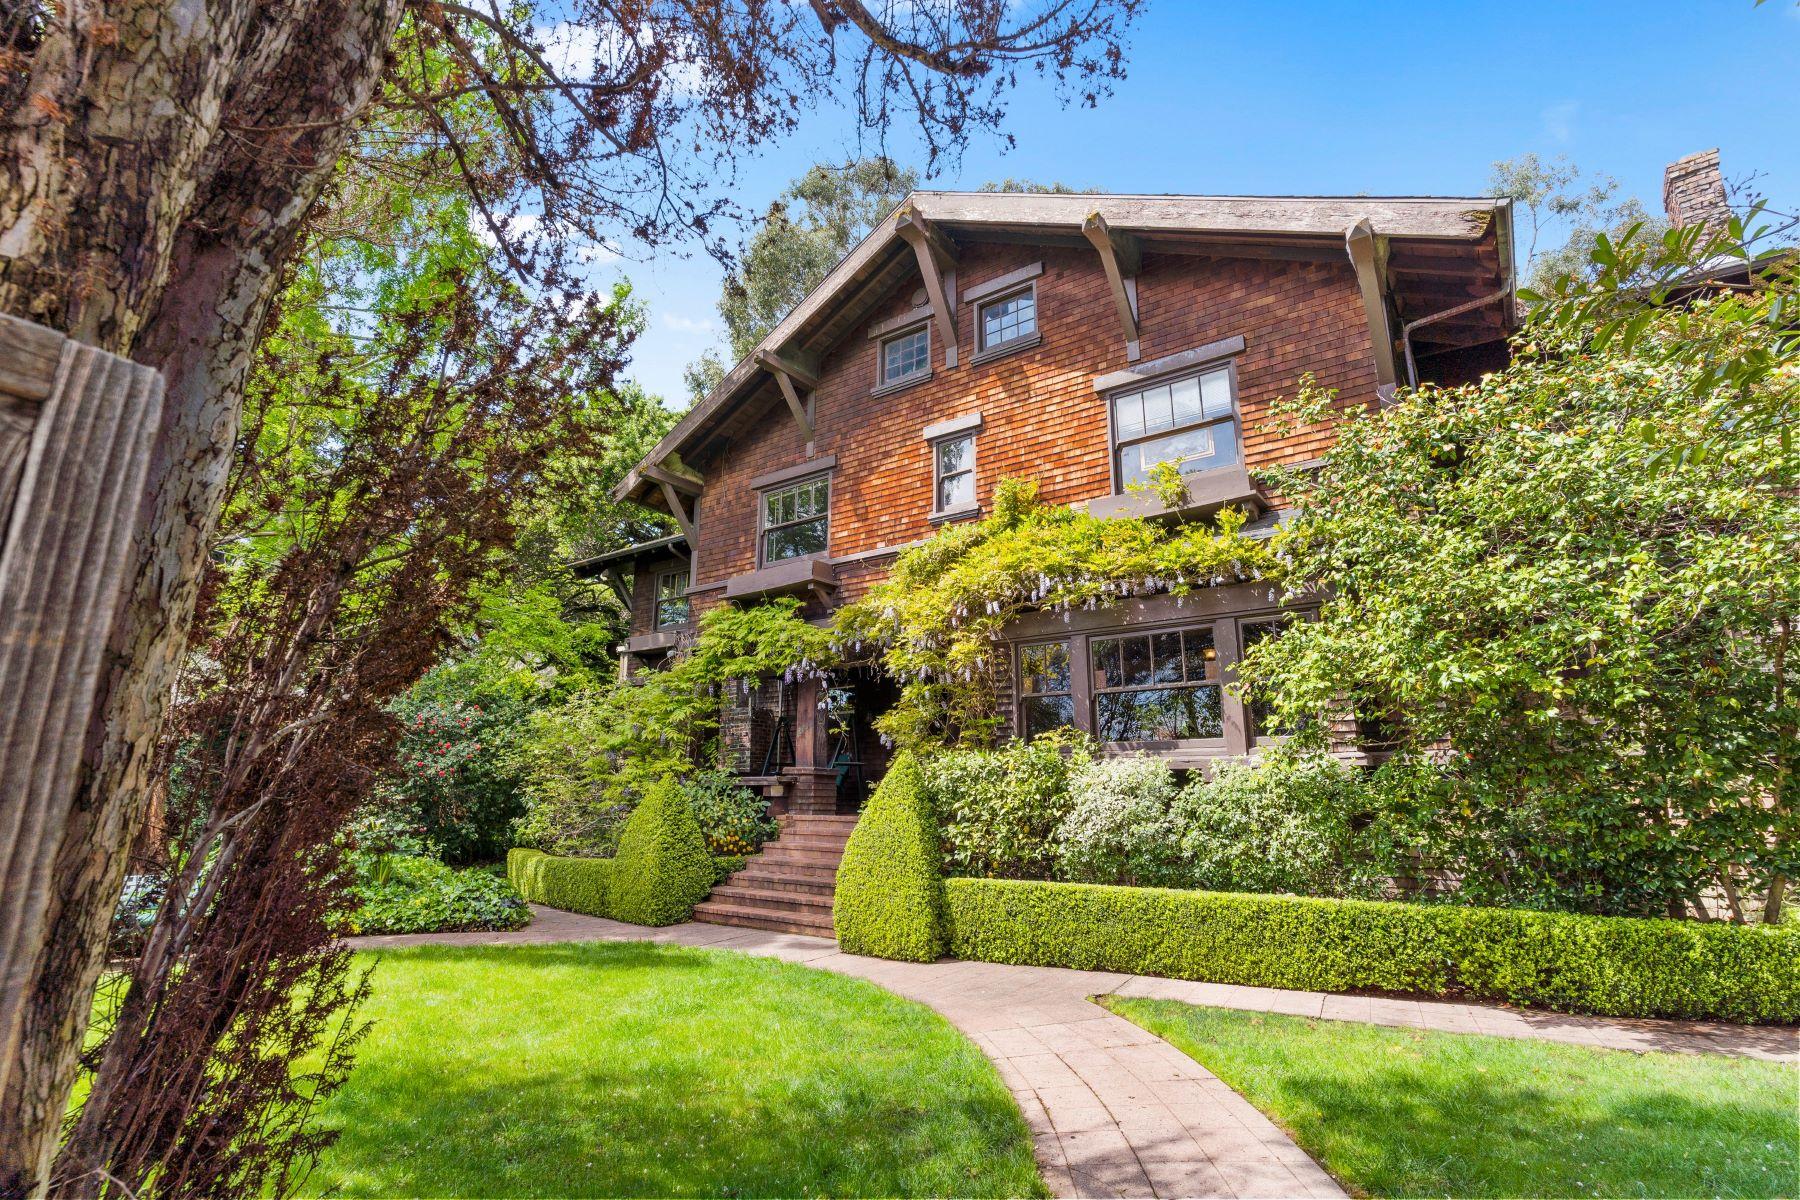 Single Family Homes for Active at Oakland Secret Sanctuary 2700 Brookdale Avenue Oakland, California 94602 United States